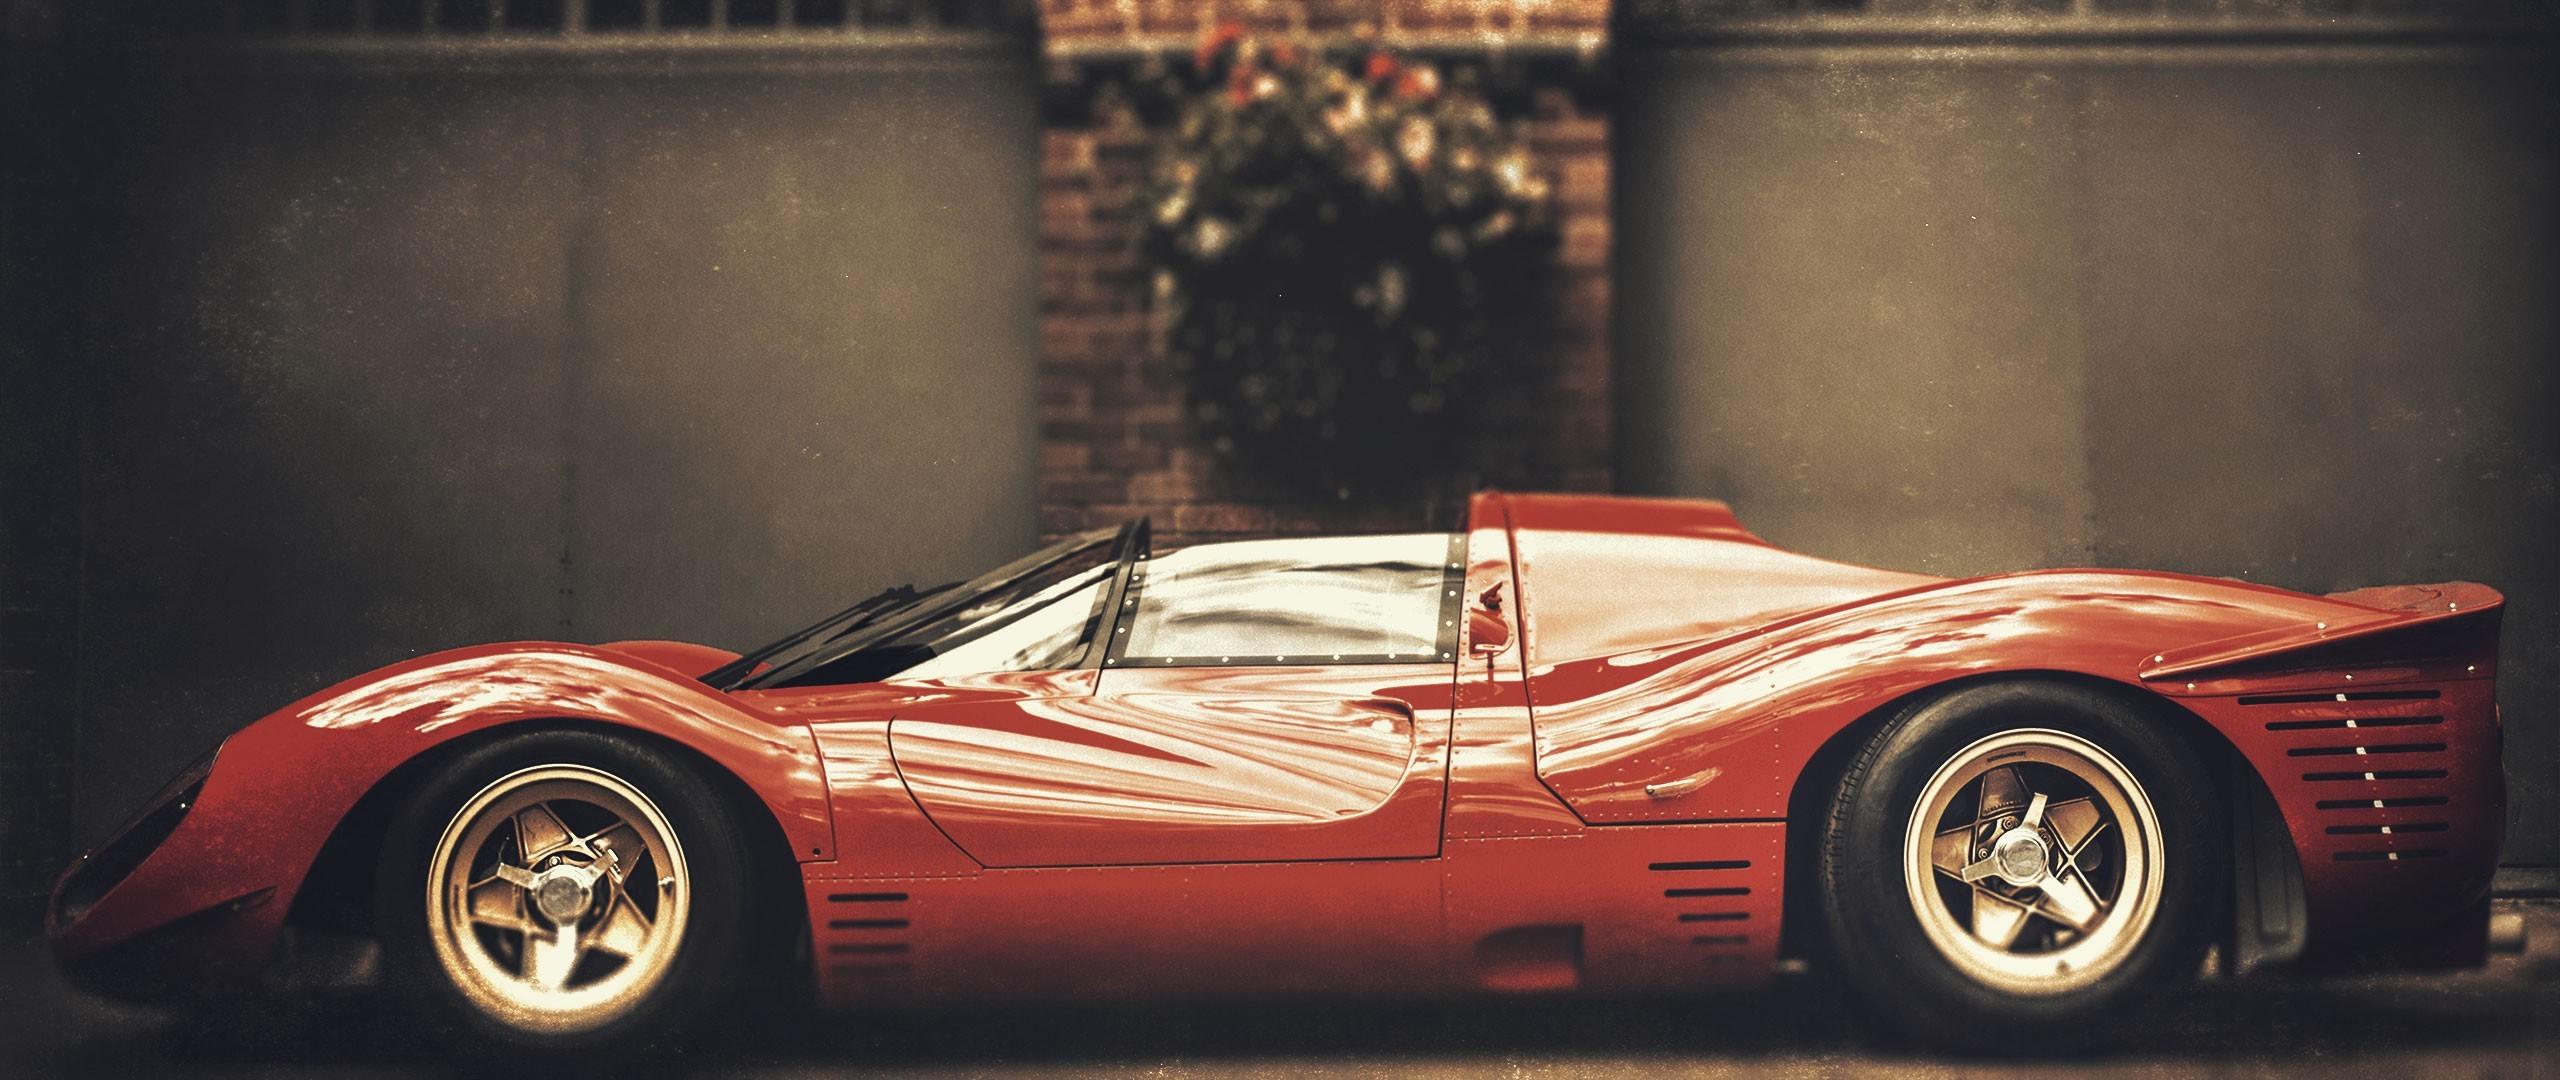 Res: 2560x1080,  Ferrari, Vintage Car Wallpapers HD Desktop and Mobile Backgroun